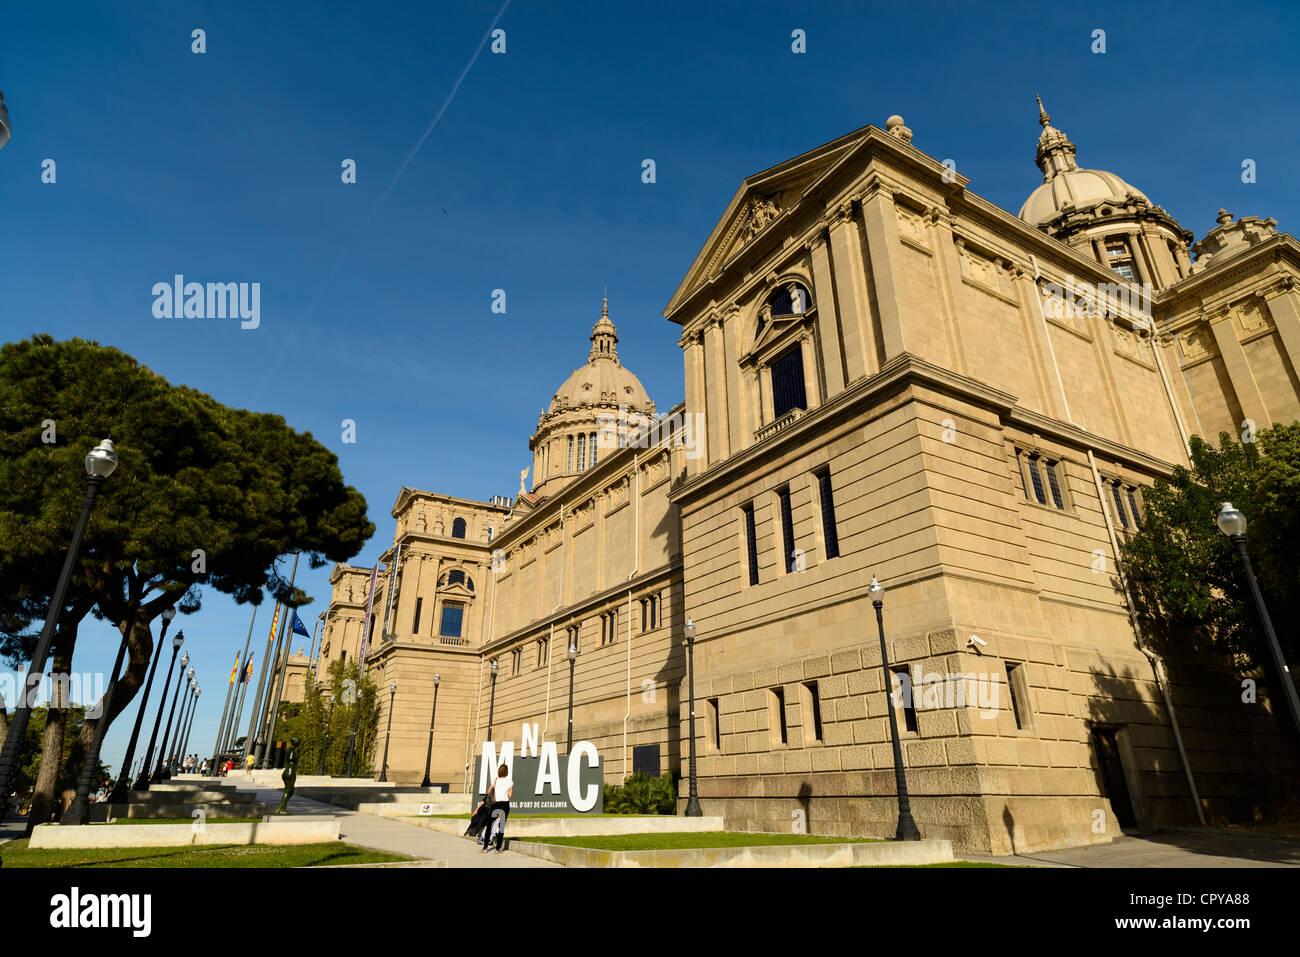 Museu Nacional d'Art de Catalunya, le Palau Nacional, Barcelone, Catalogne, Espagne Photo Stock